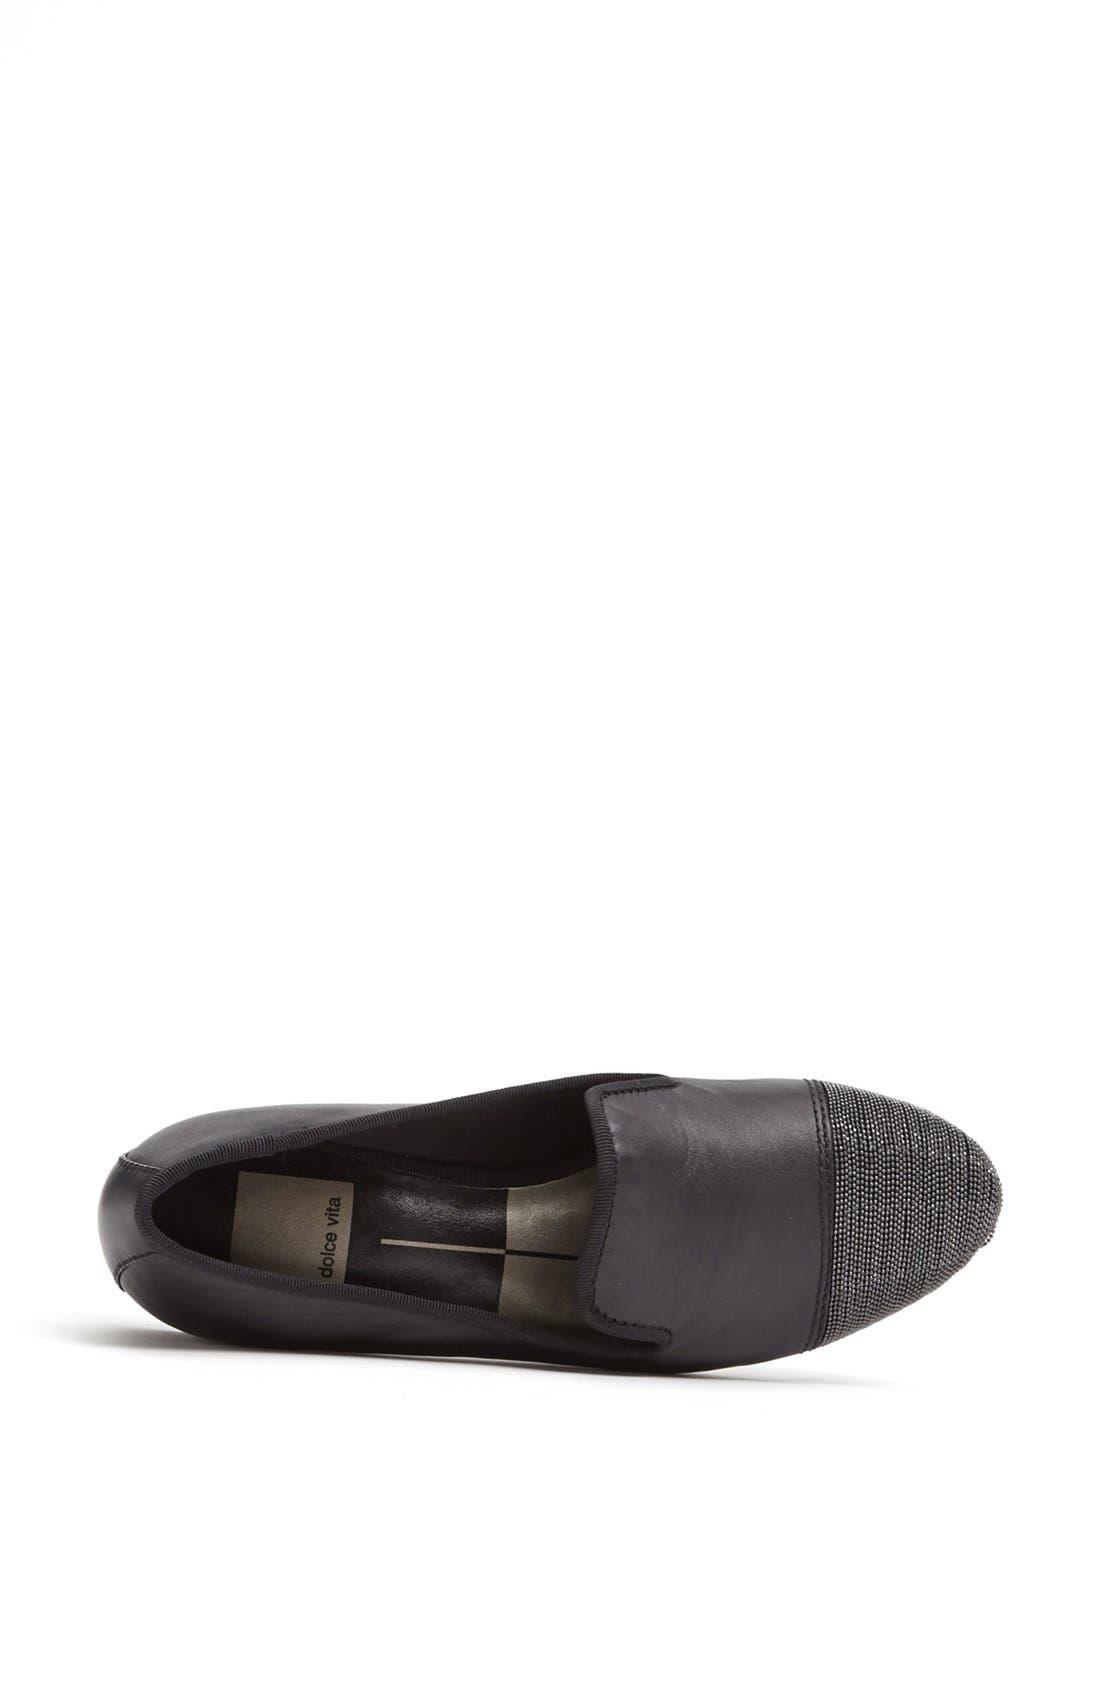 Alternate Image 3  - Dolce Vita Loafer Flat